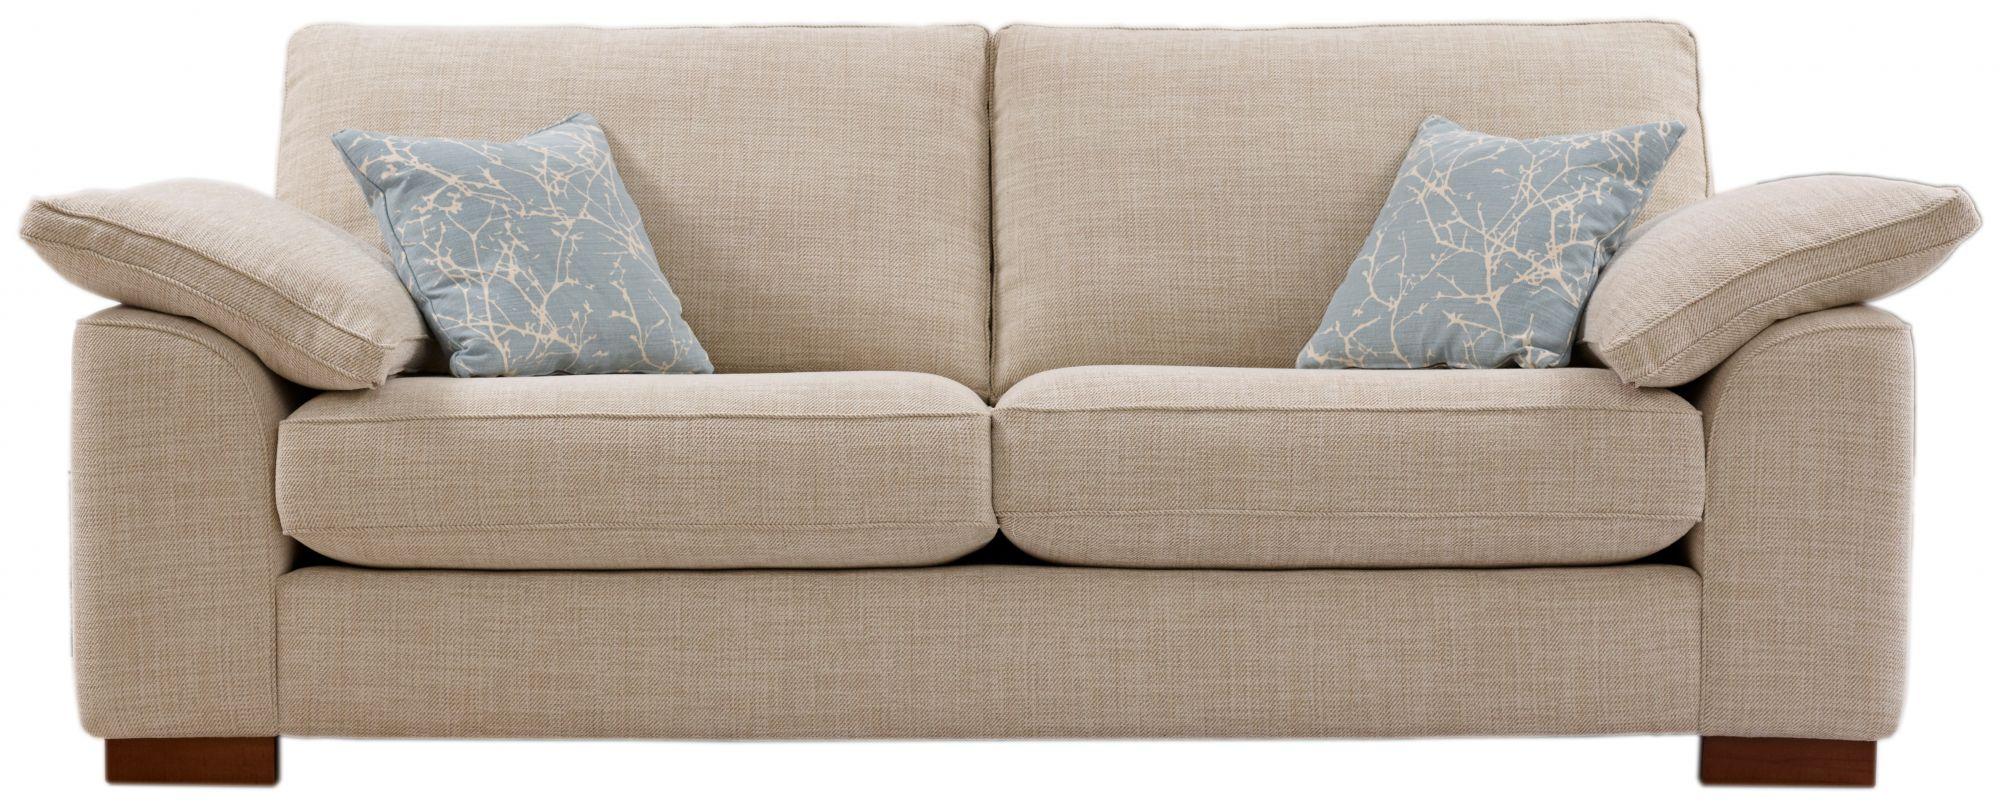 Ashwood Designs Ashwood Larsson 4 Seater Sofa Large